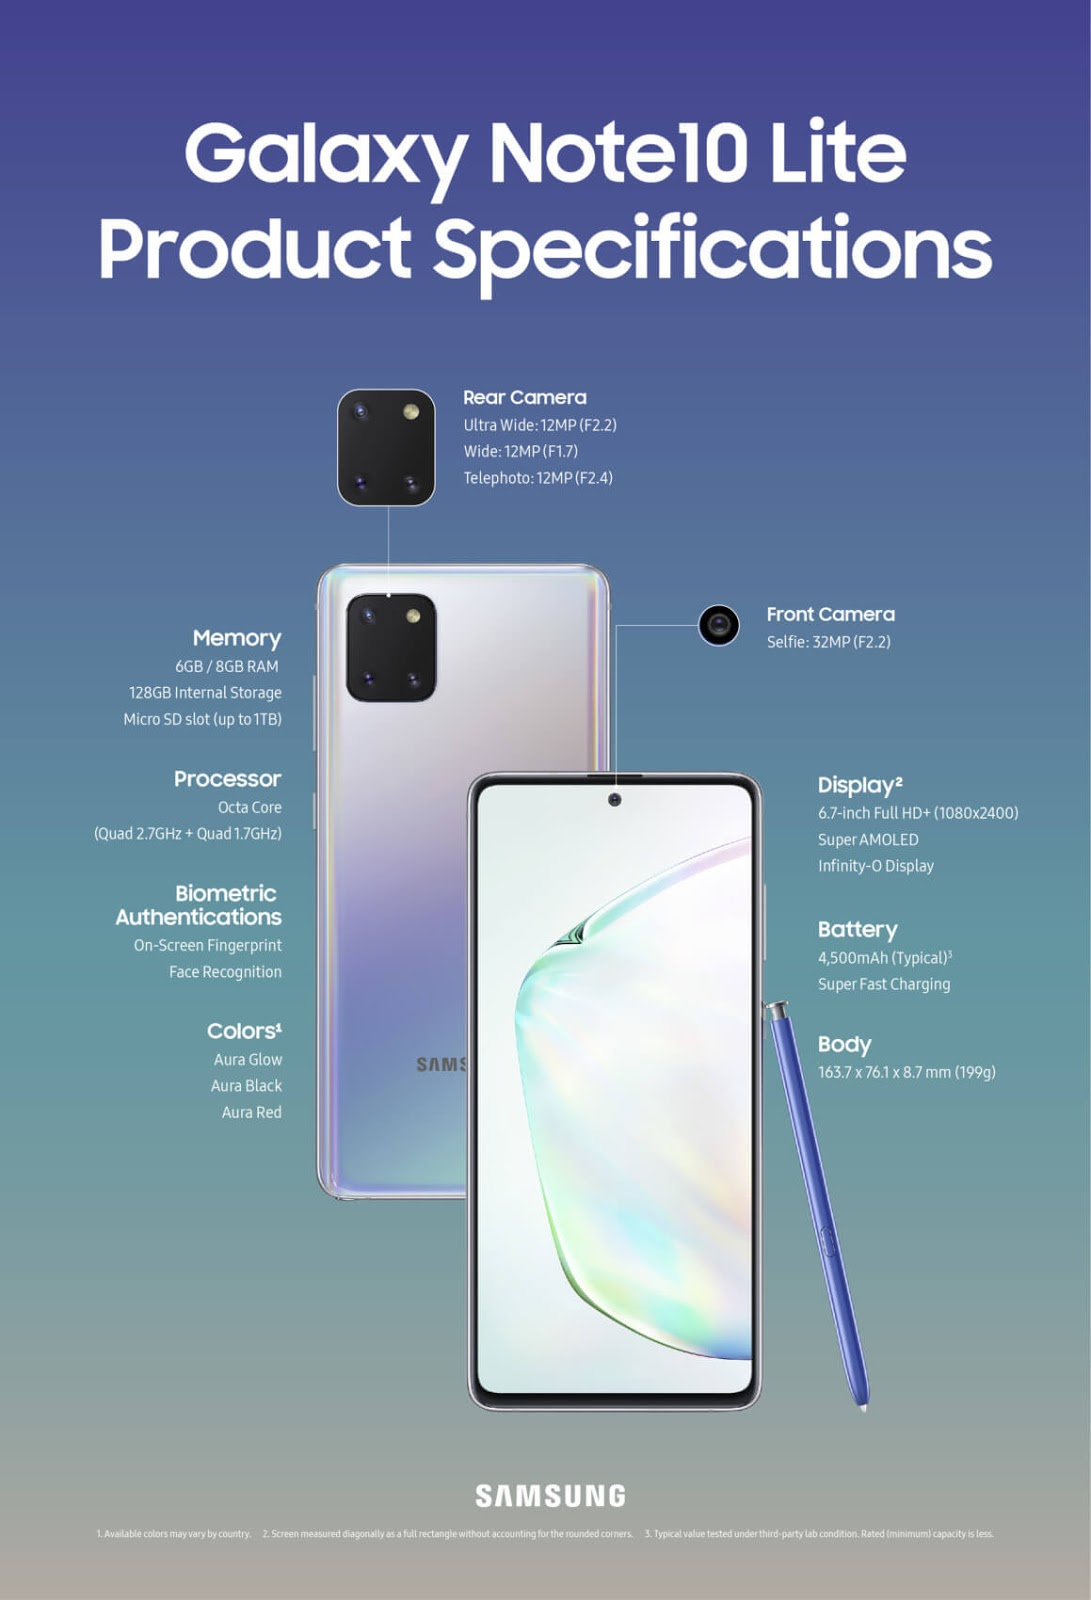 سامسونج تعلن رسميا عن هاتفي Galaxy Note 10 Lite و Galaxy S10 Lite